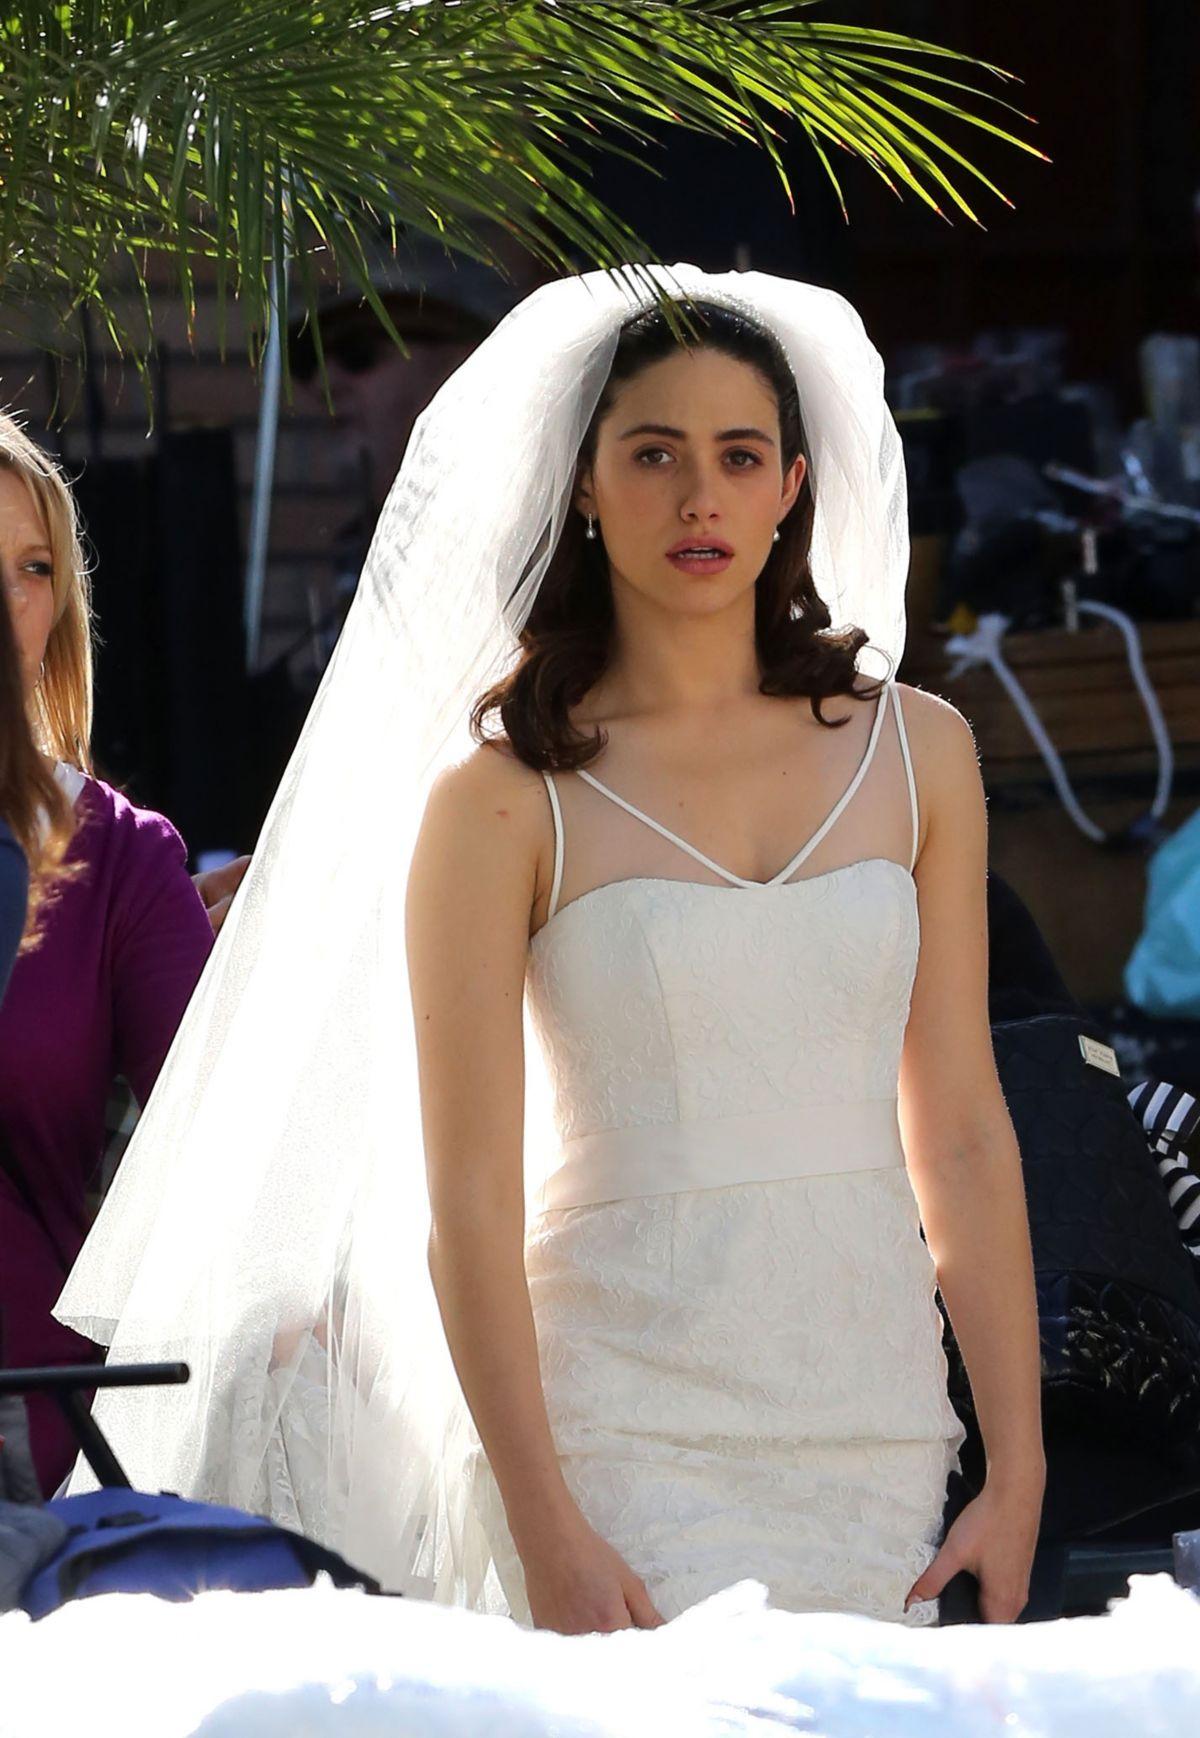 Emmy Rossum Wedding.Emmy Rossum In Wedding Dress On The Set Of Shameless In Los Angeles